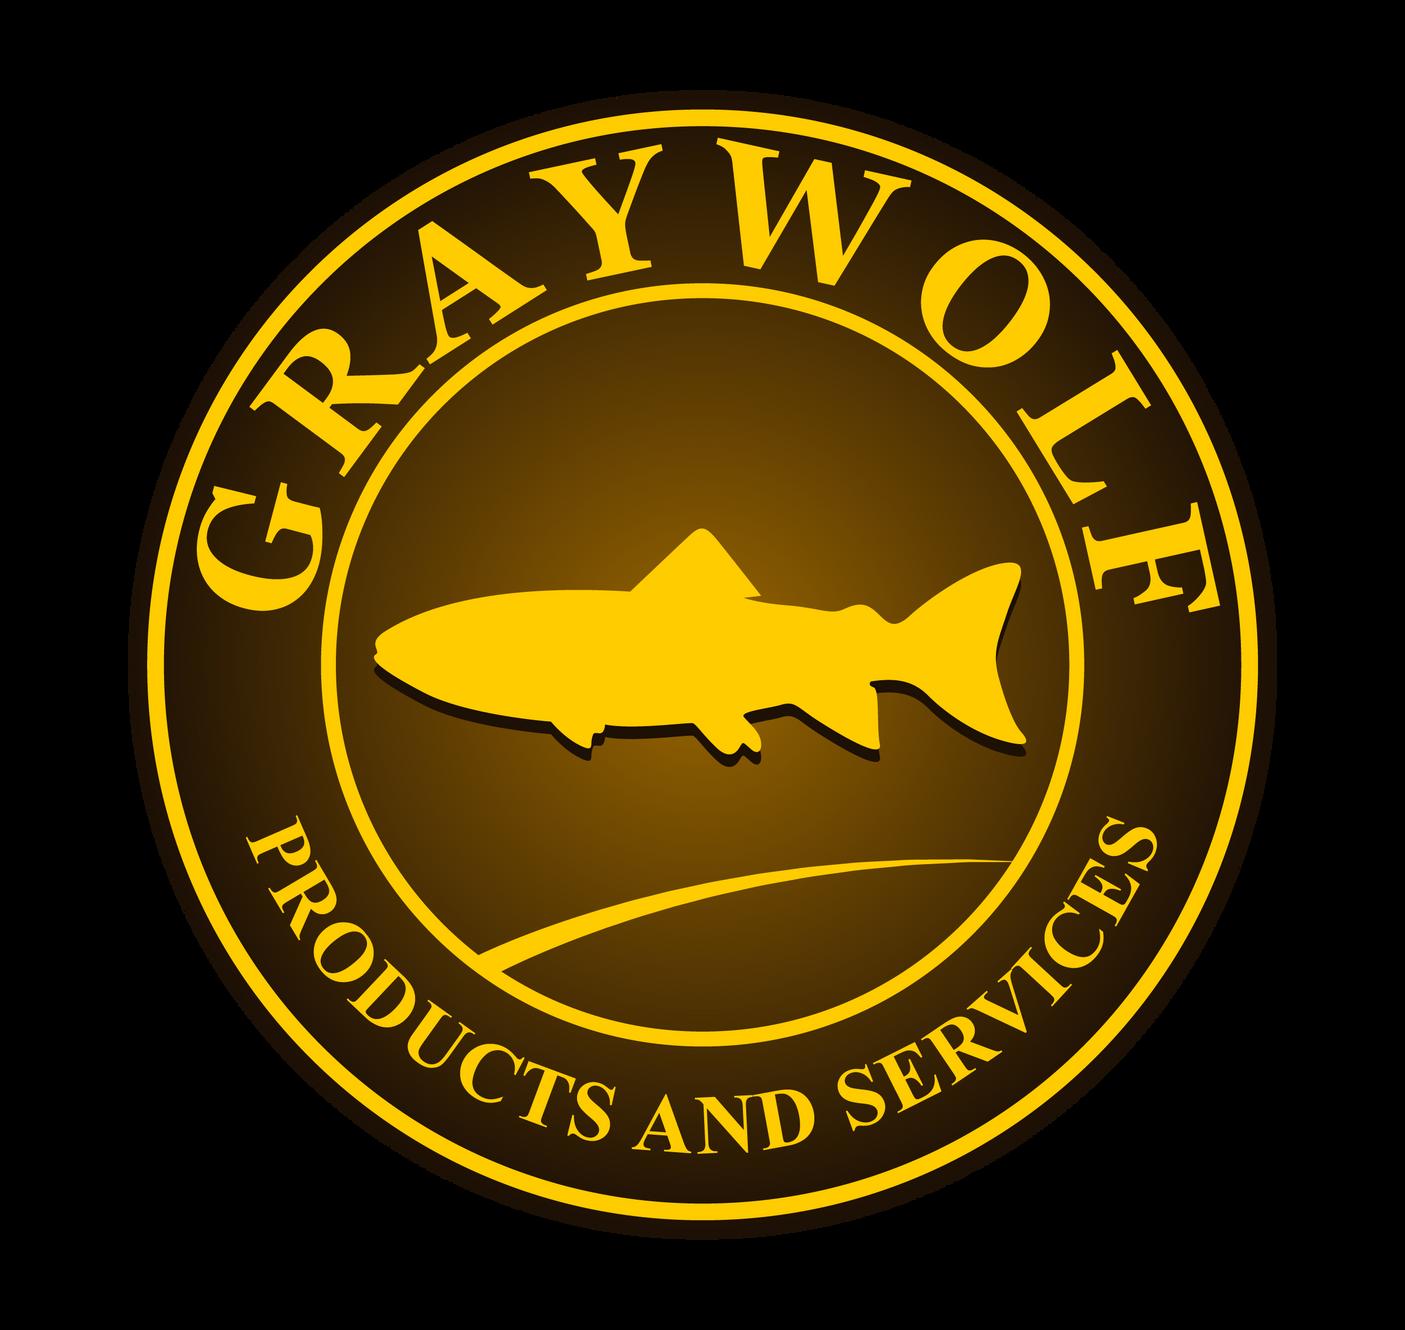 www.graywolfrods.com